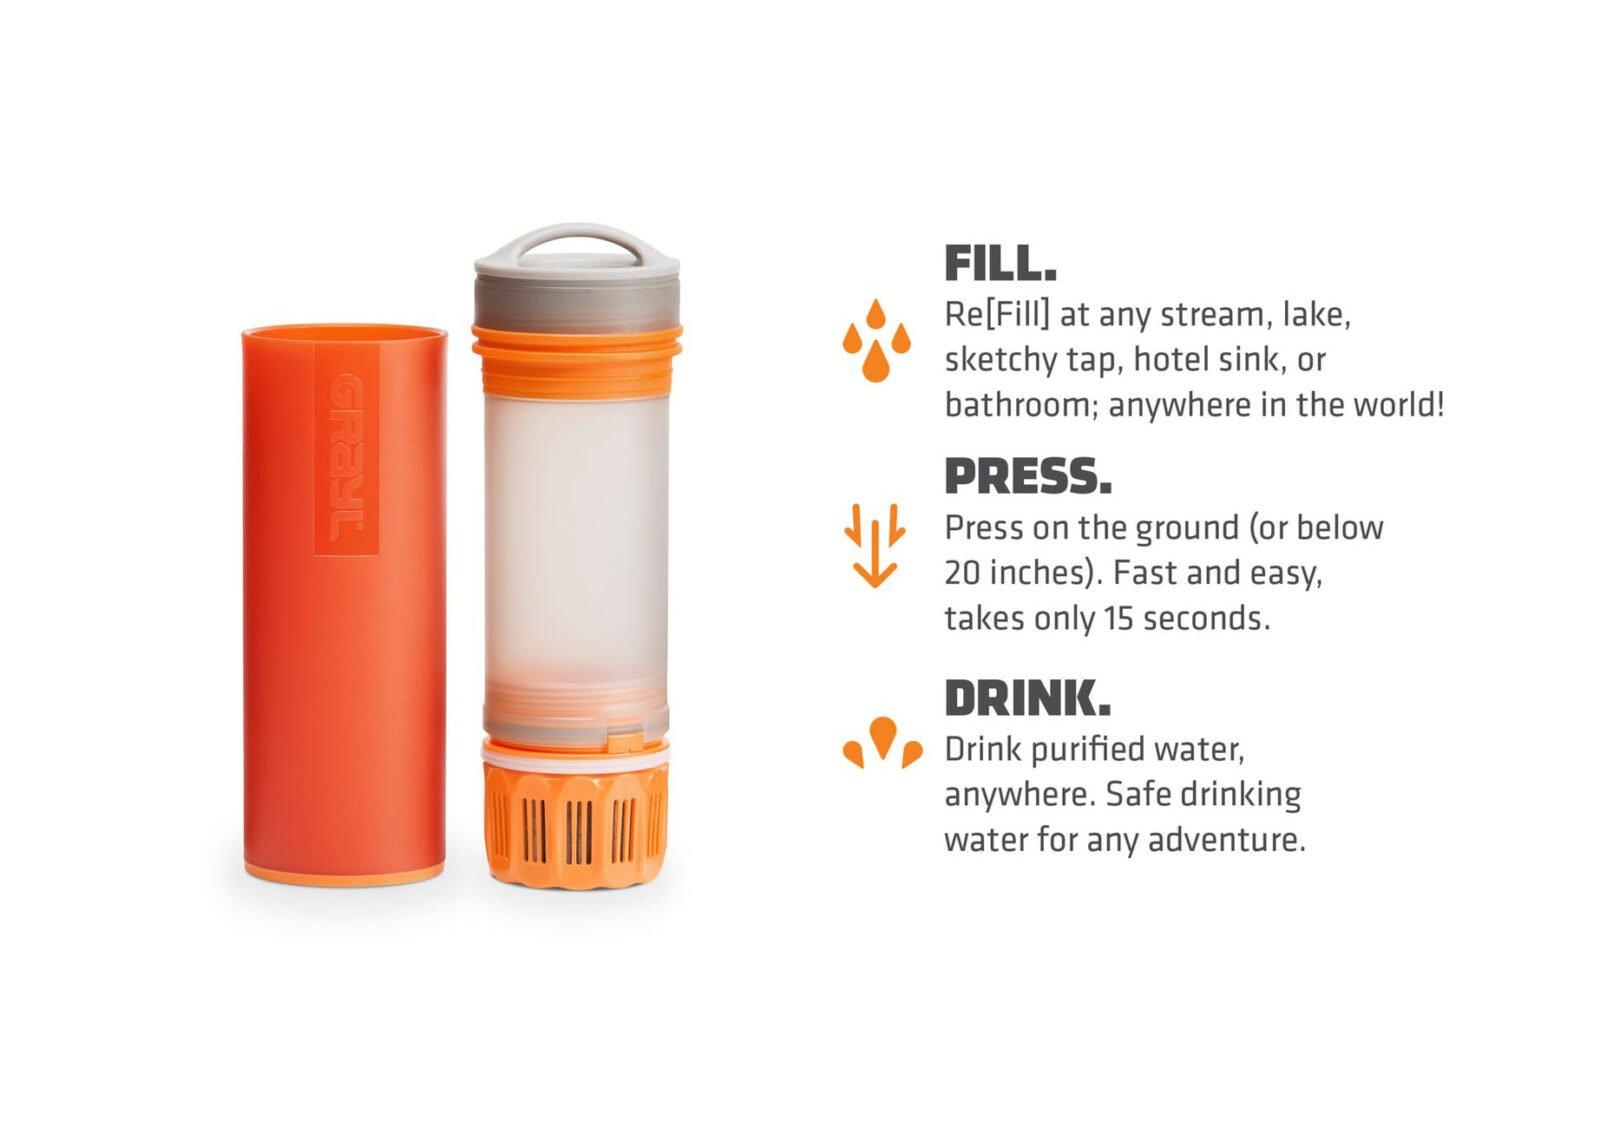 Grayl Ultralight Purification Bottle 1600x1133 - The Grayl Ultralight Purification Bottle